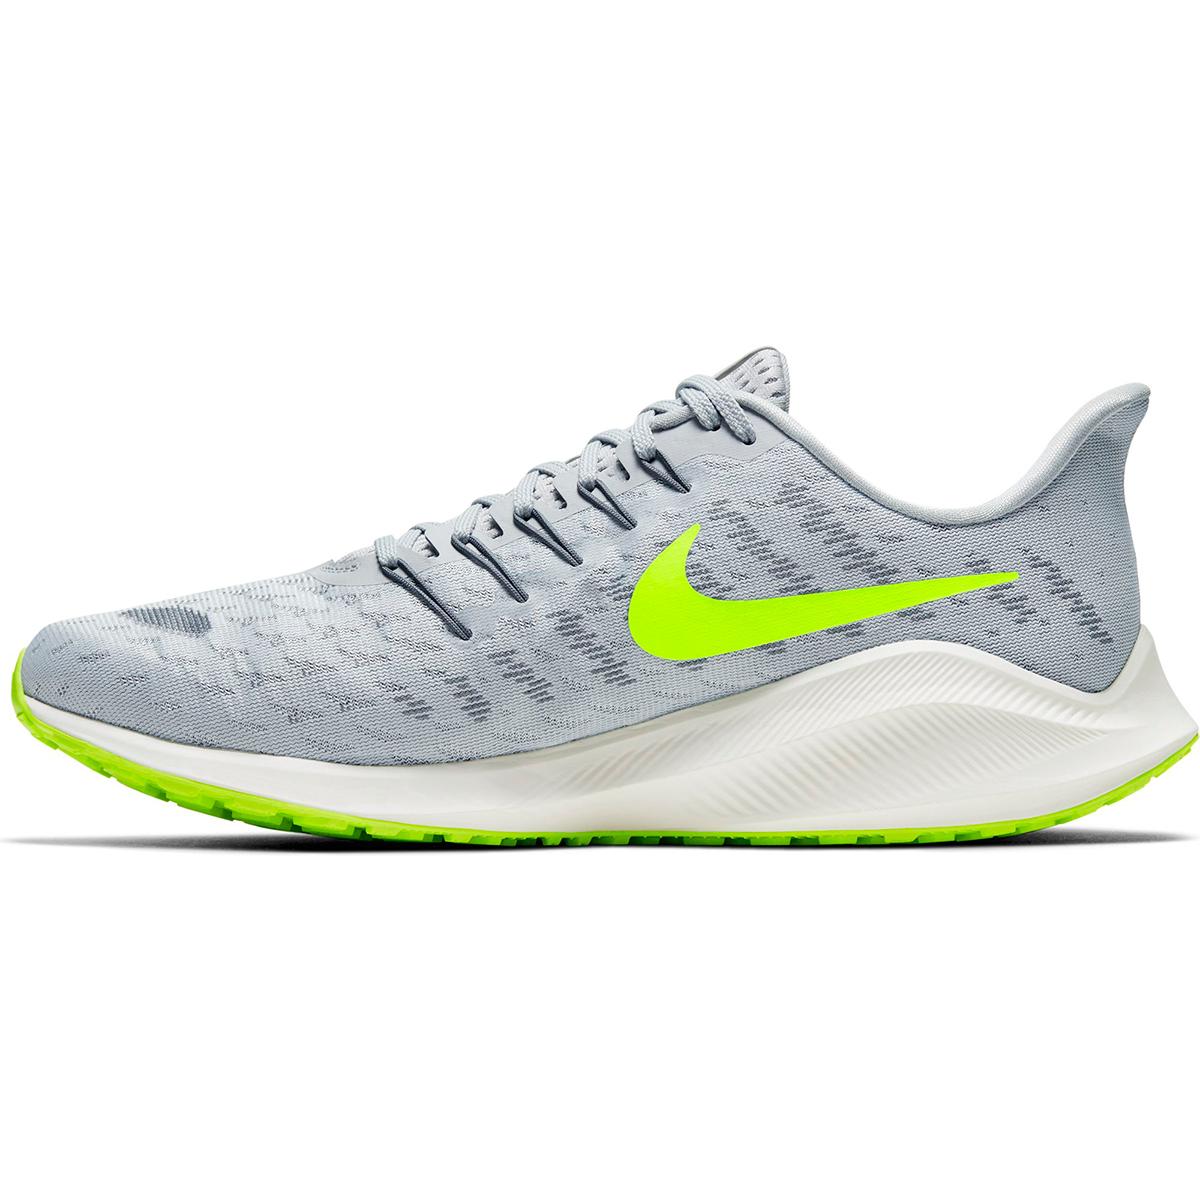 Men's Nike Air Zoom Vomero 14 Running Shoe - Color: Grey Fog/Smoke Grey/Volt/Sail (Regular Width) - Size: 6, Grey Fog/Smoke Grey/Volt/Sail, large, image 2